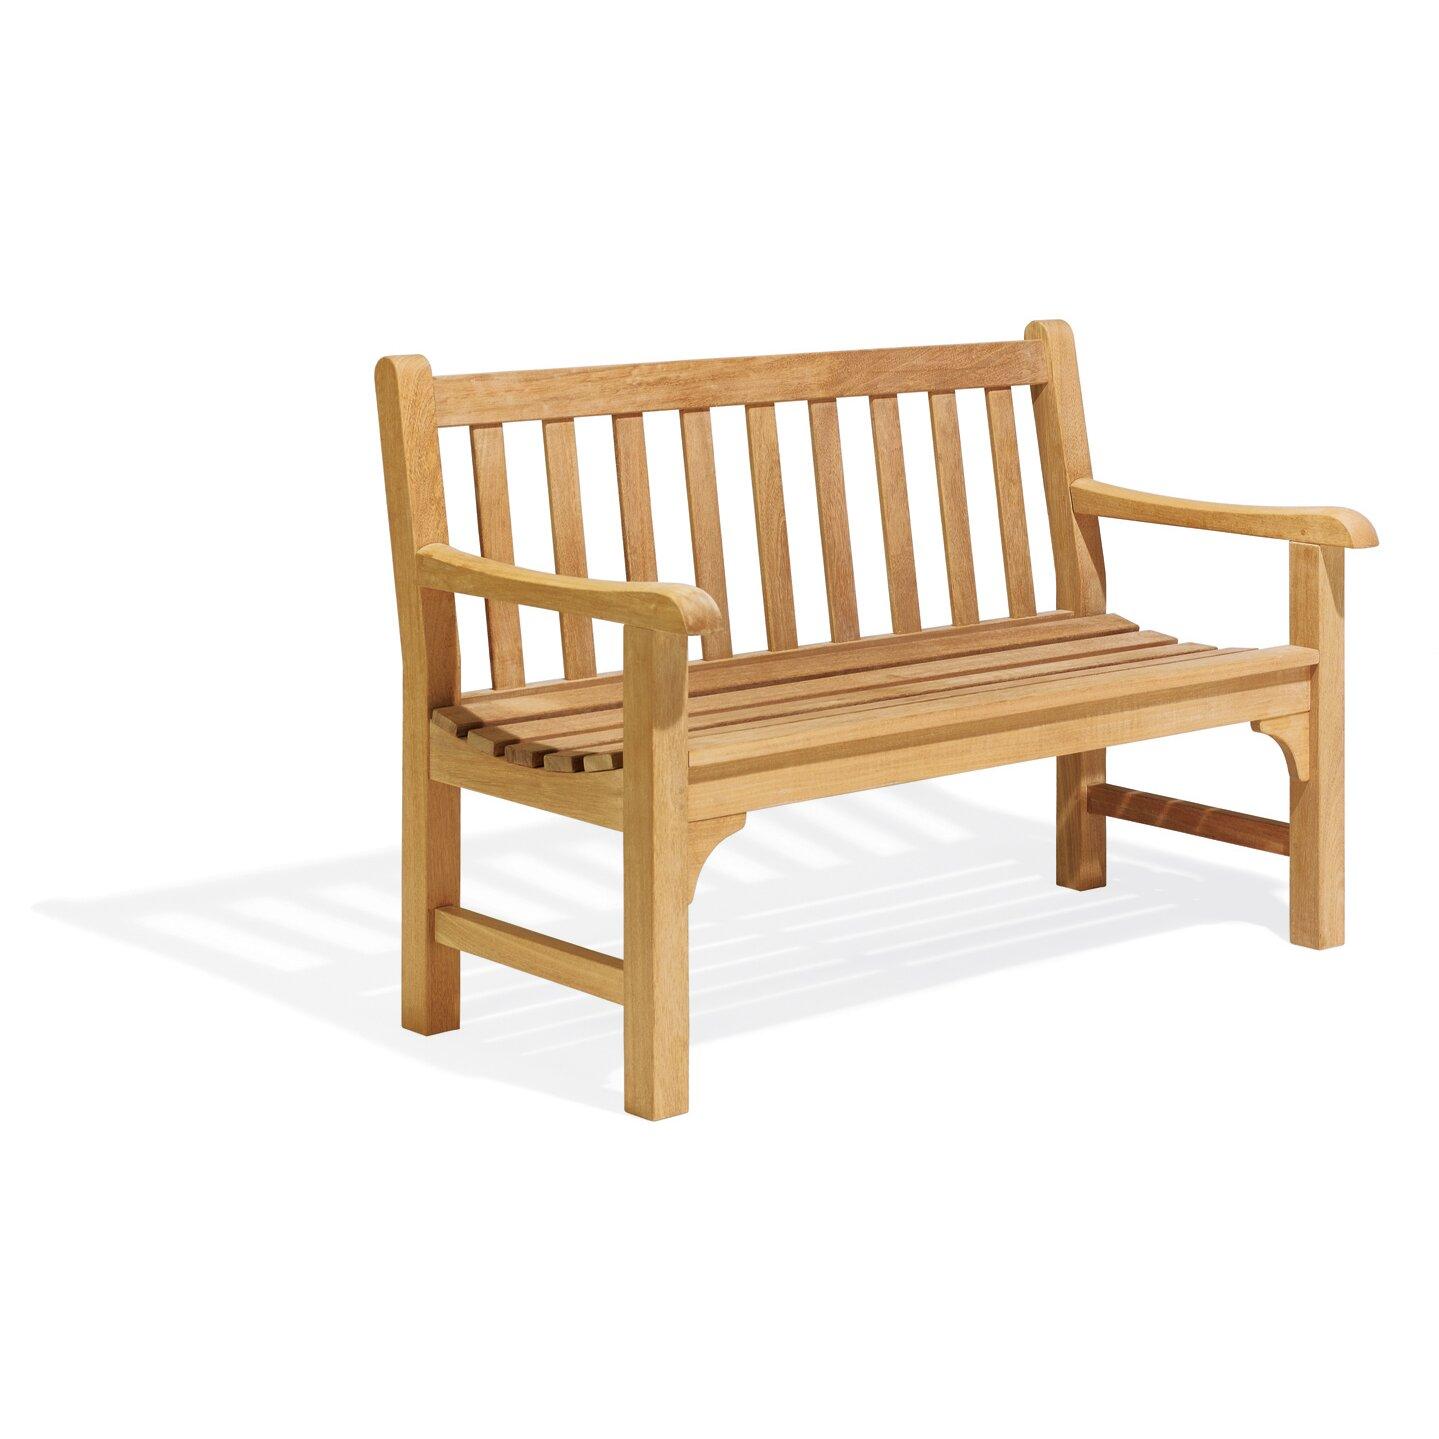 Oxford garden essex wood garden bench reviews wayfair for Outdoor furniture essex